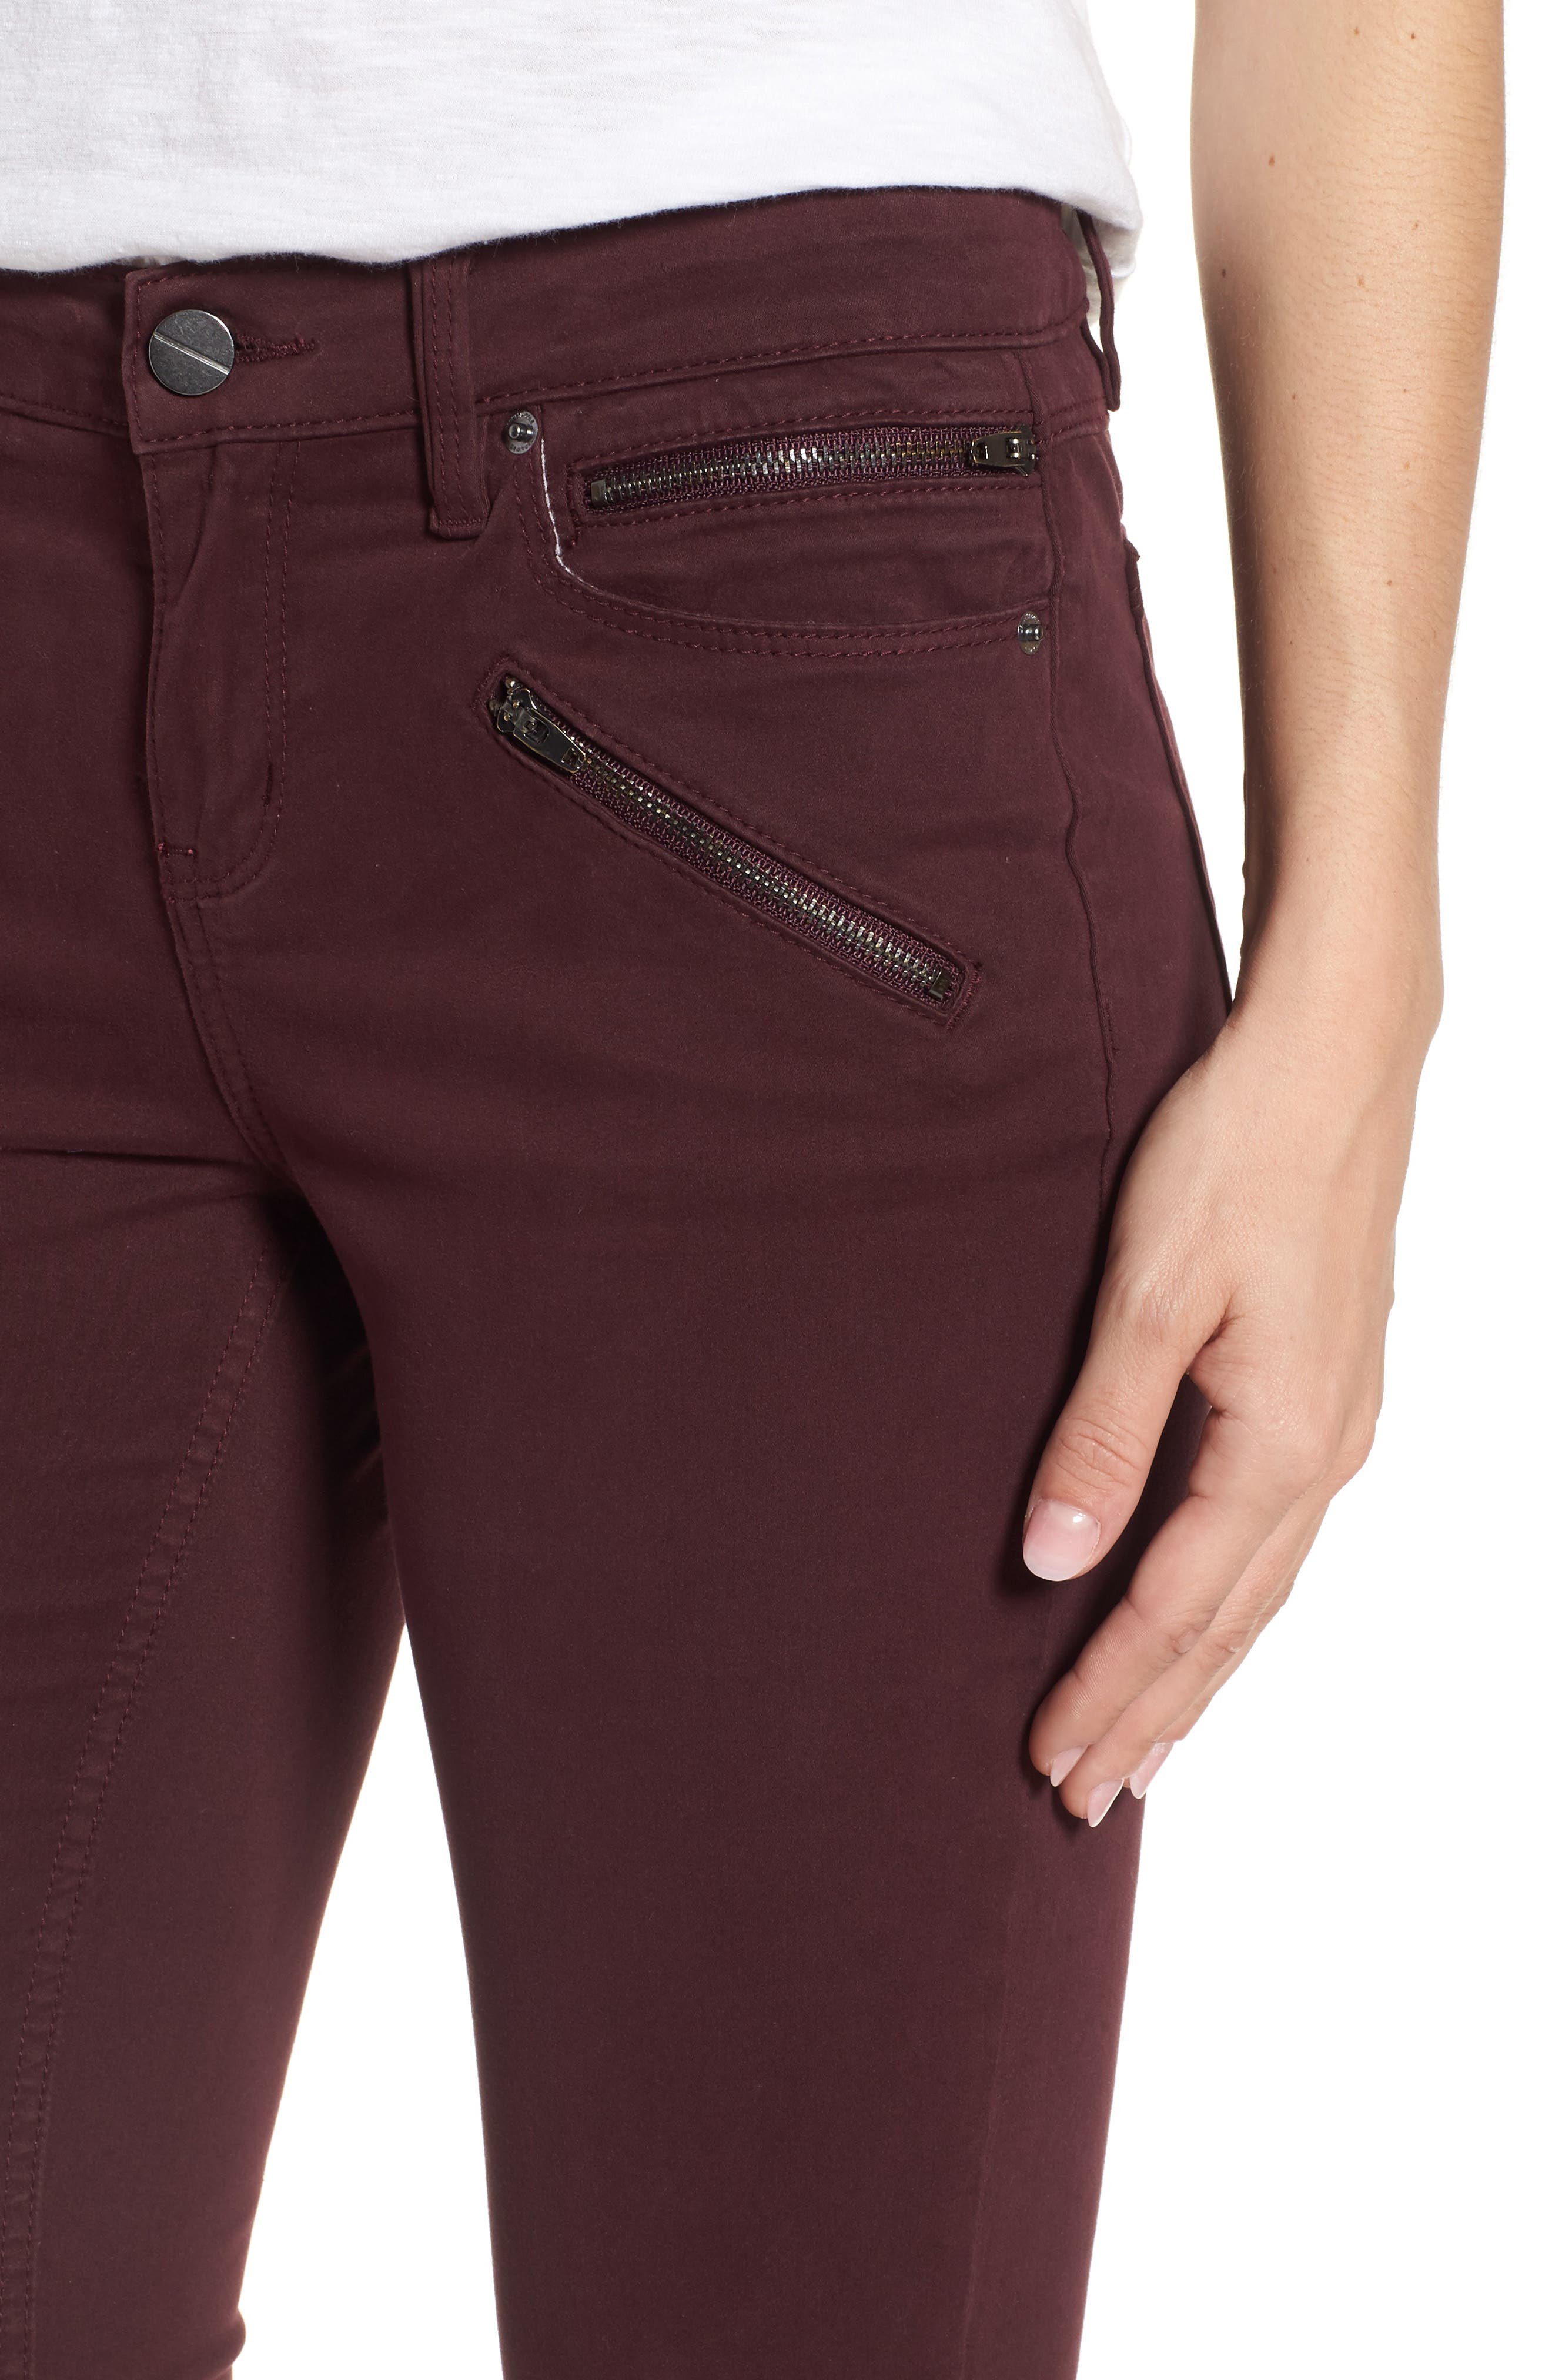 Moto Skinny Jeans,                             Alternate thumbnail 4, color,                             932